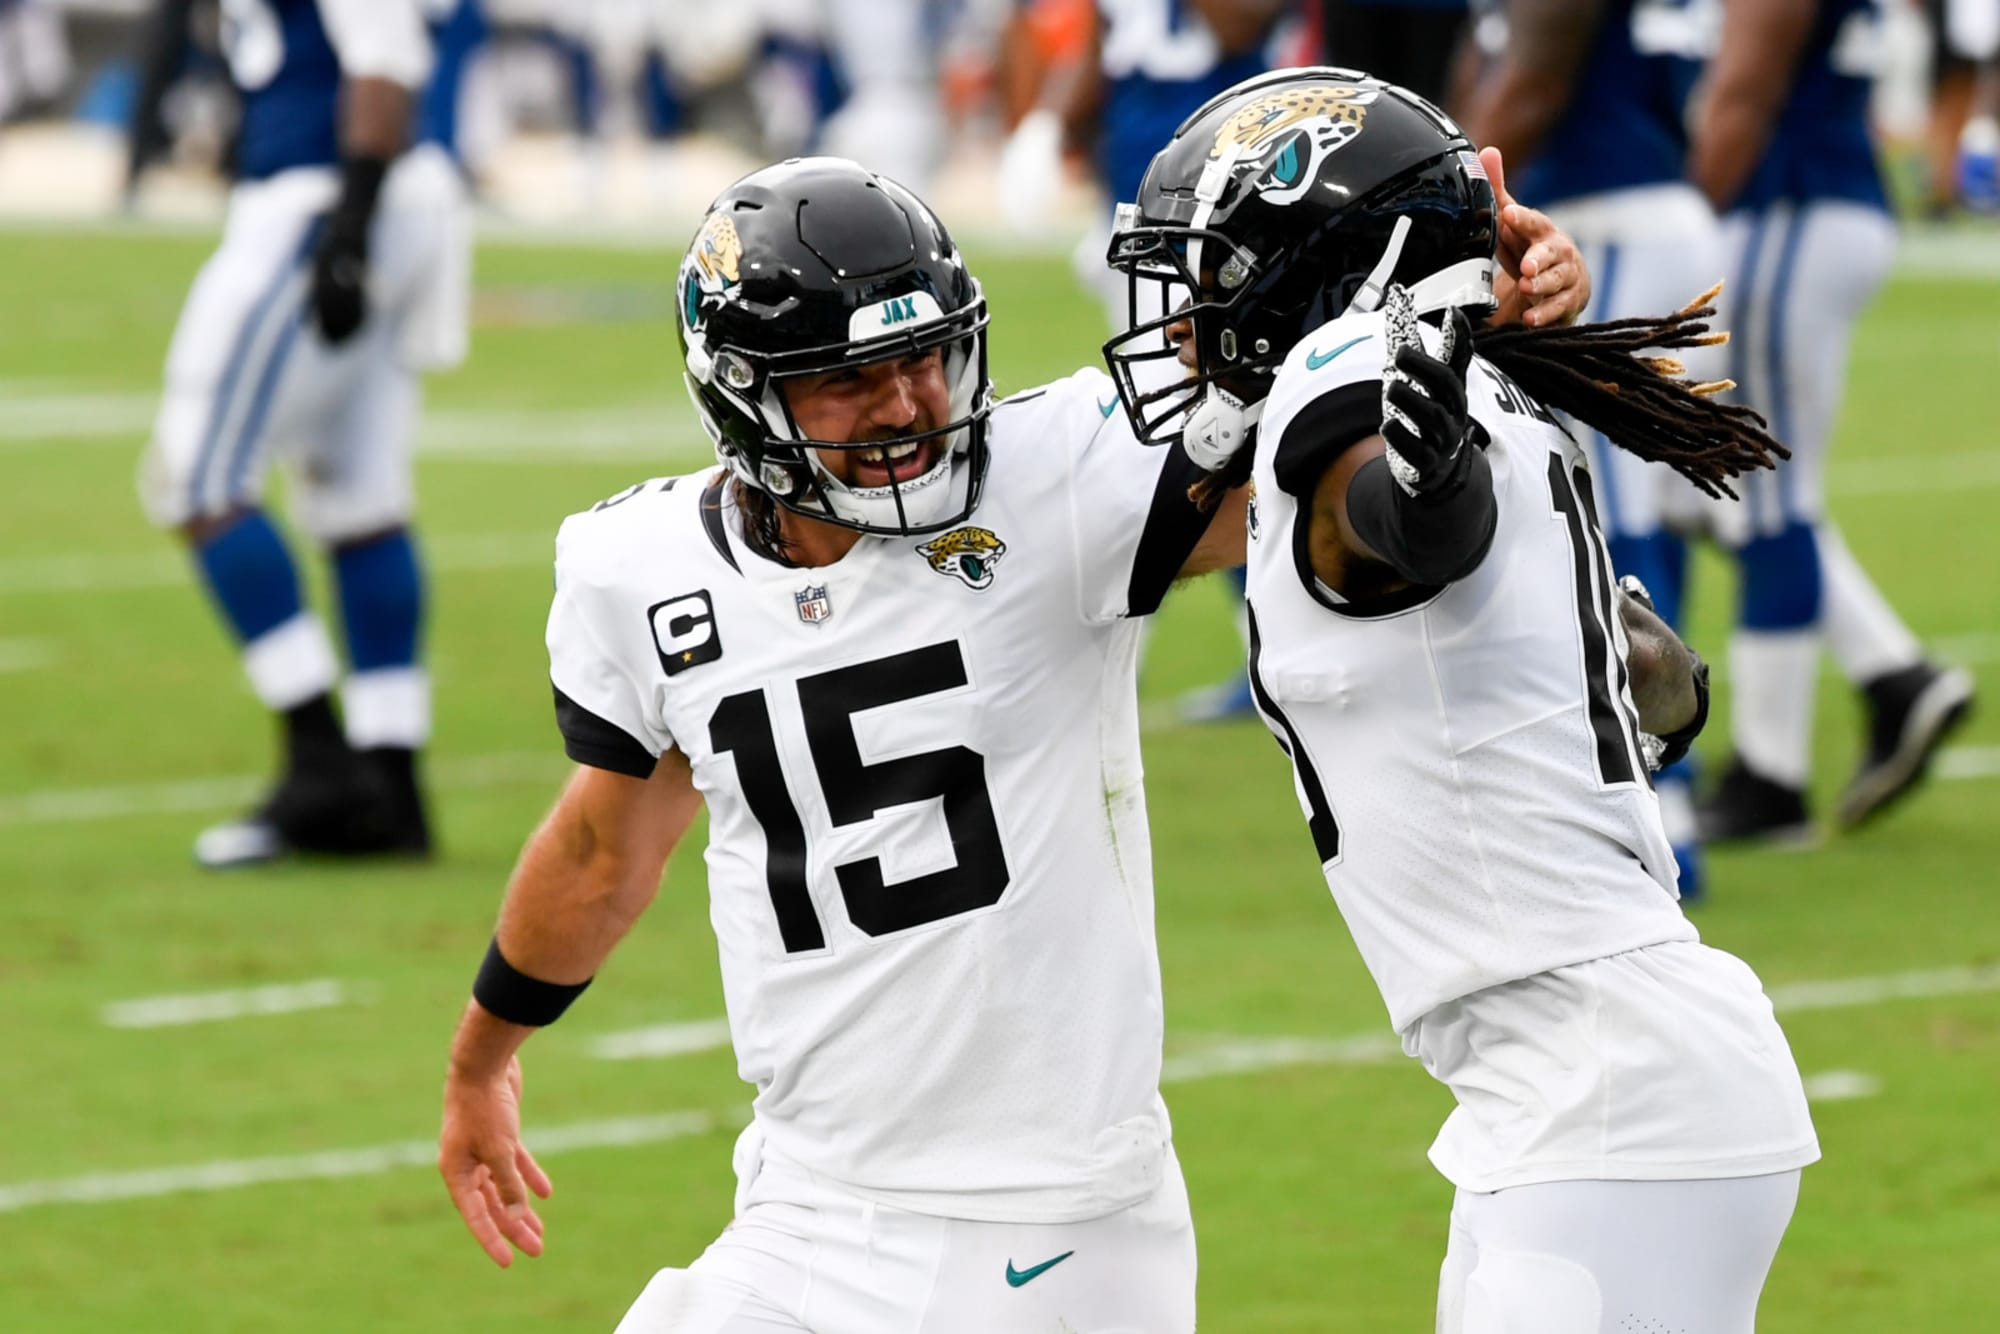 3 observations that Jacksonville Jaguars fans will find encouraging